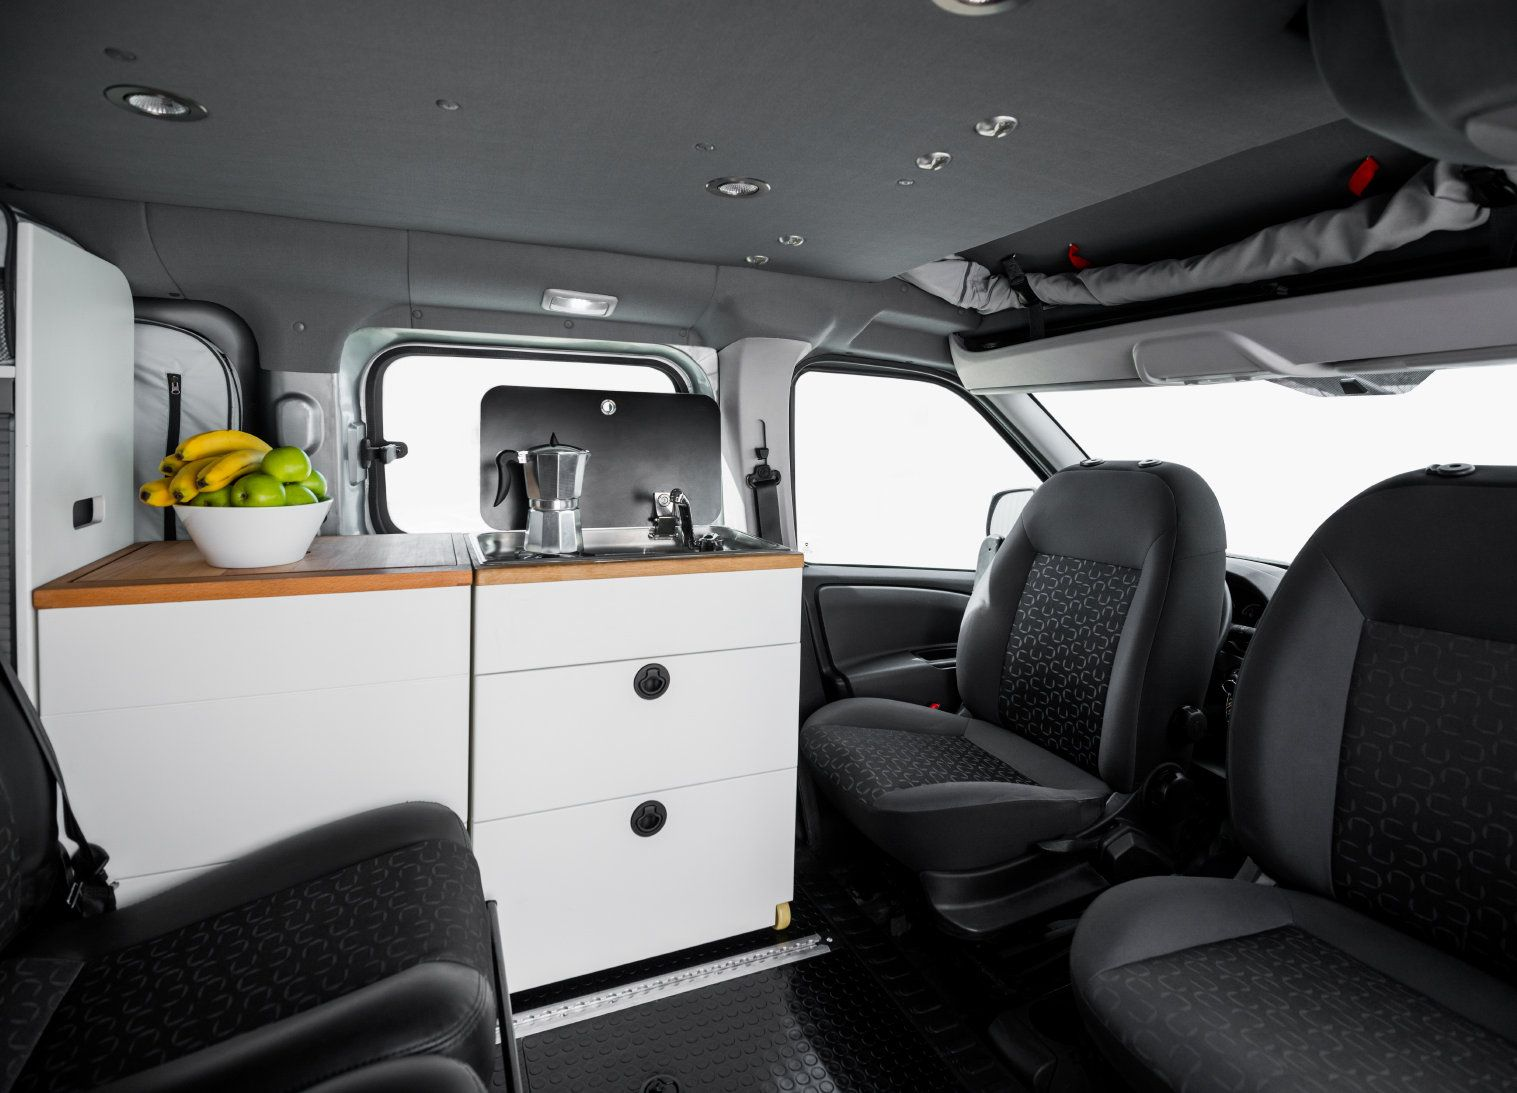 sipras flip campingbox fr ihr pkw camping ausrstung. Black Bedroom Furniture Sets. Home Design Ideas